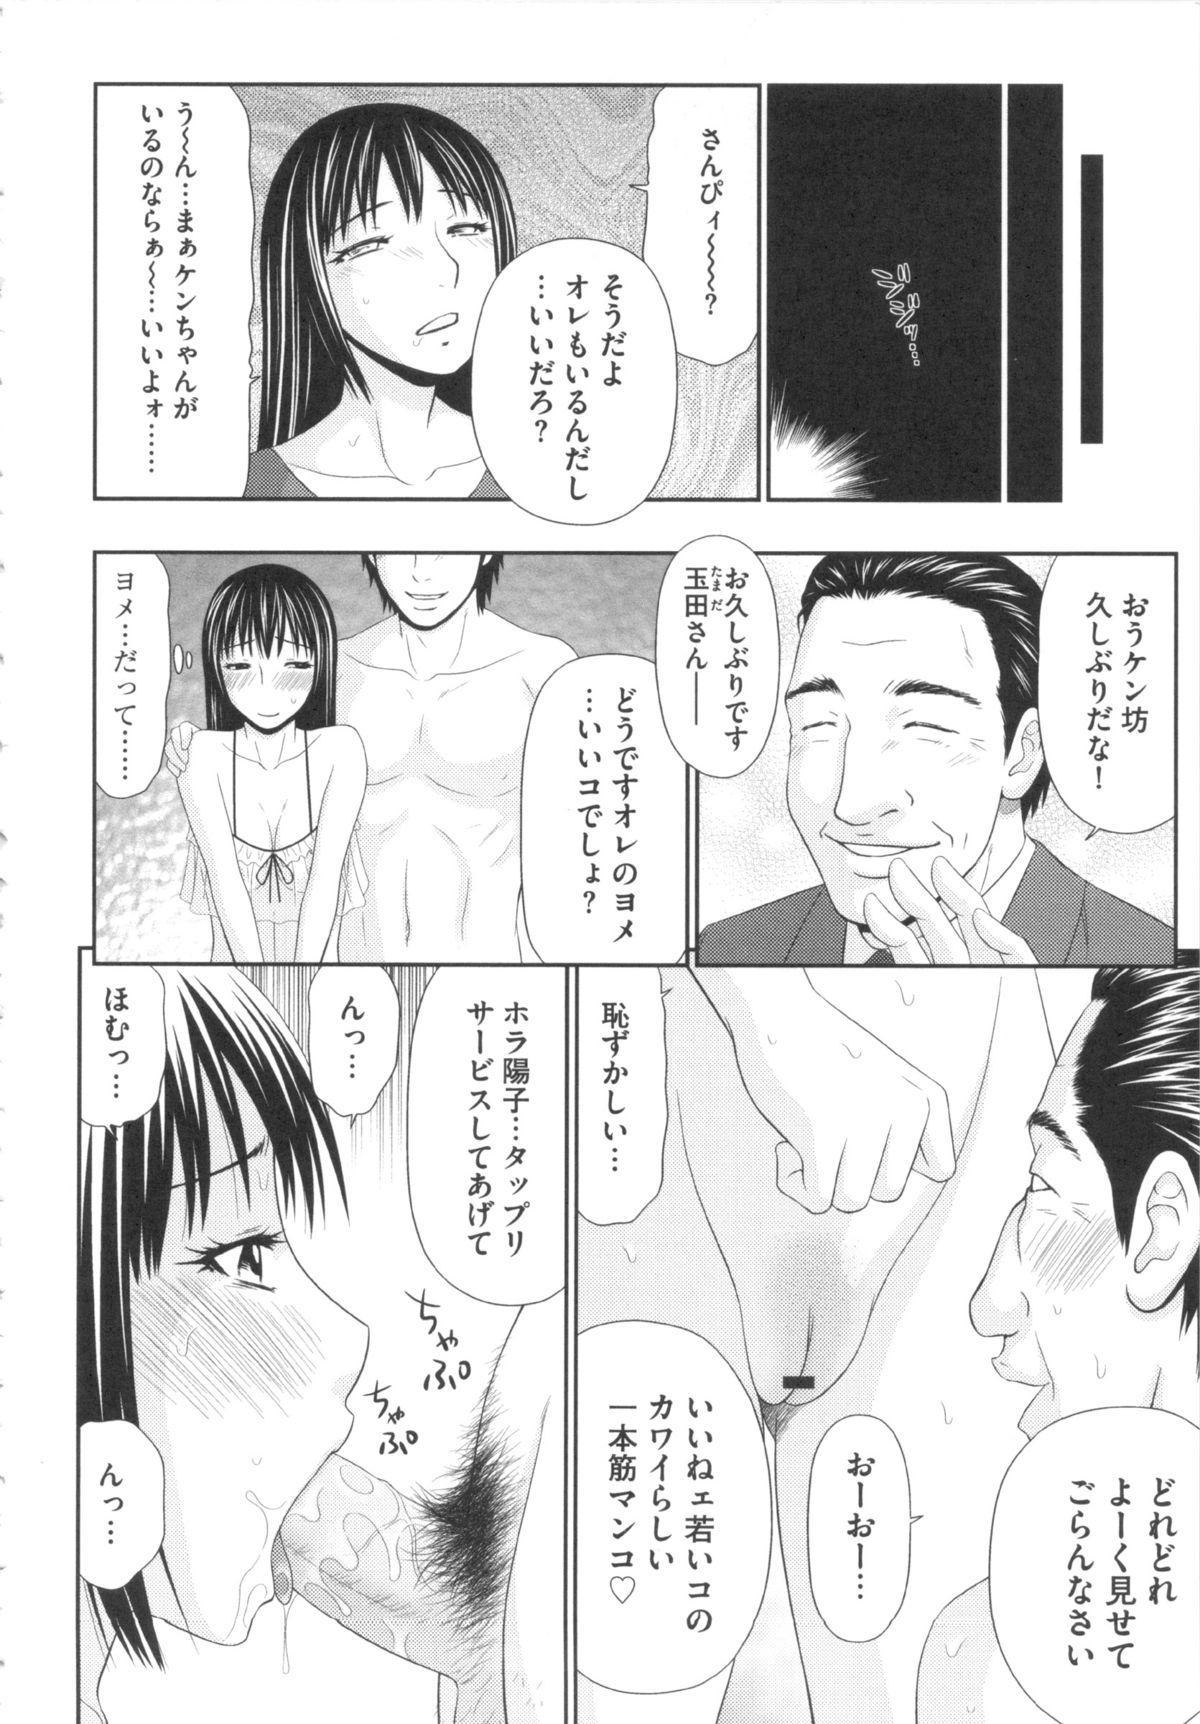 Kiseki No Zaajiru - Sperm of Miracle 186